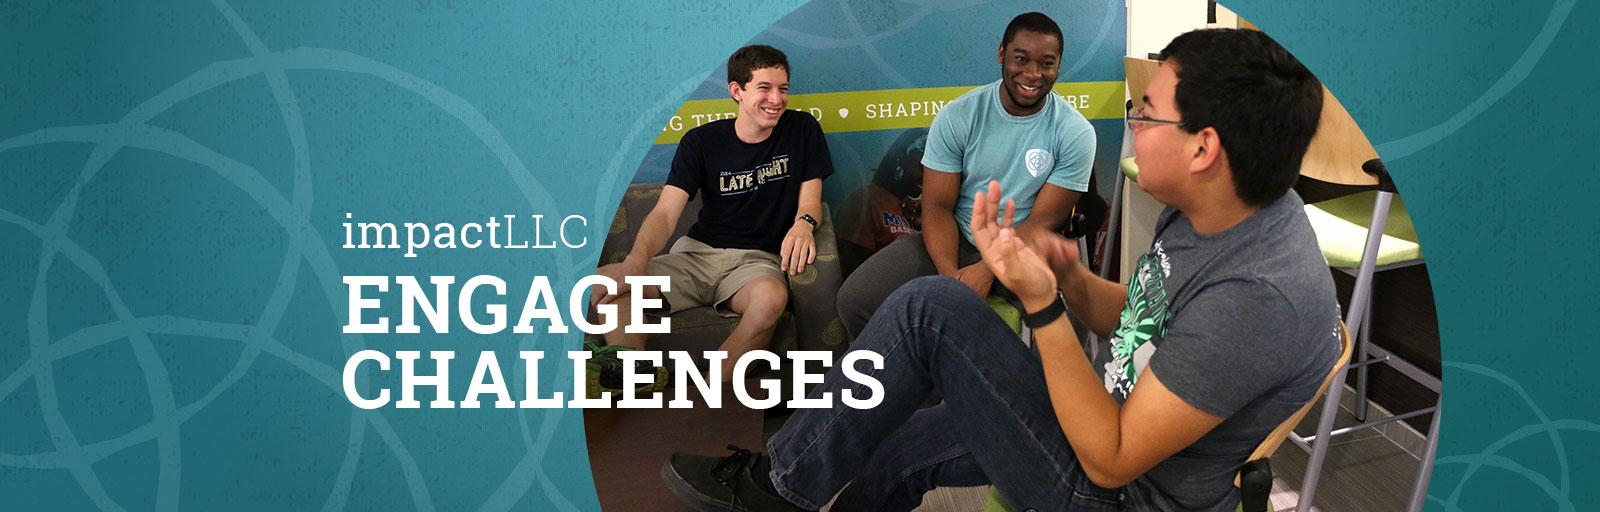 mc_llc-impact-engage challenges